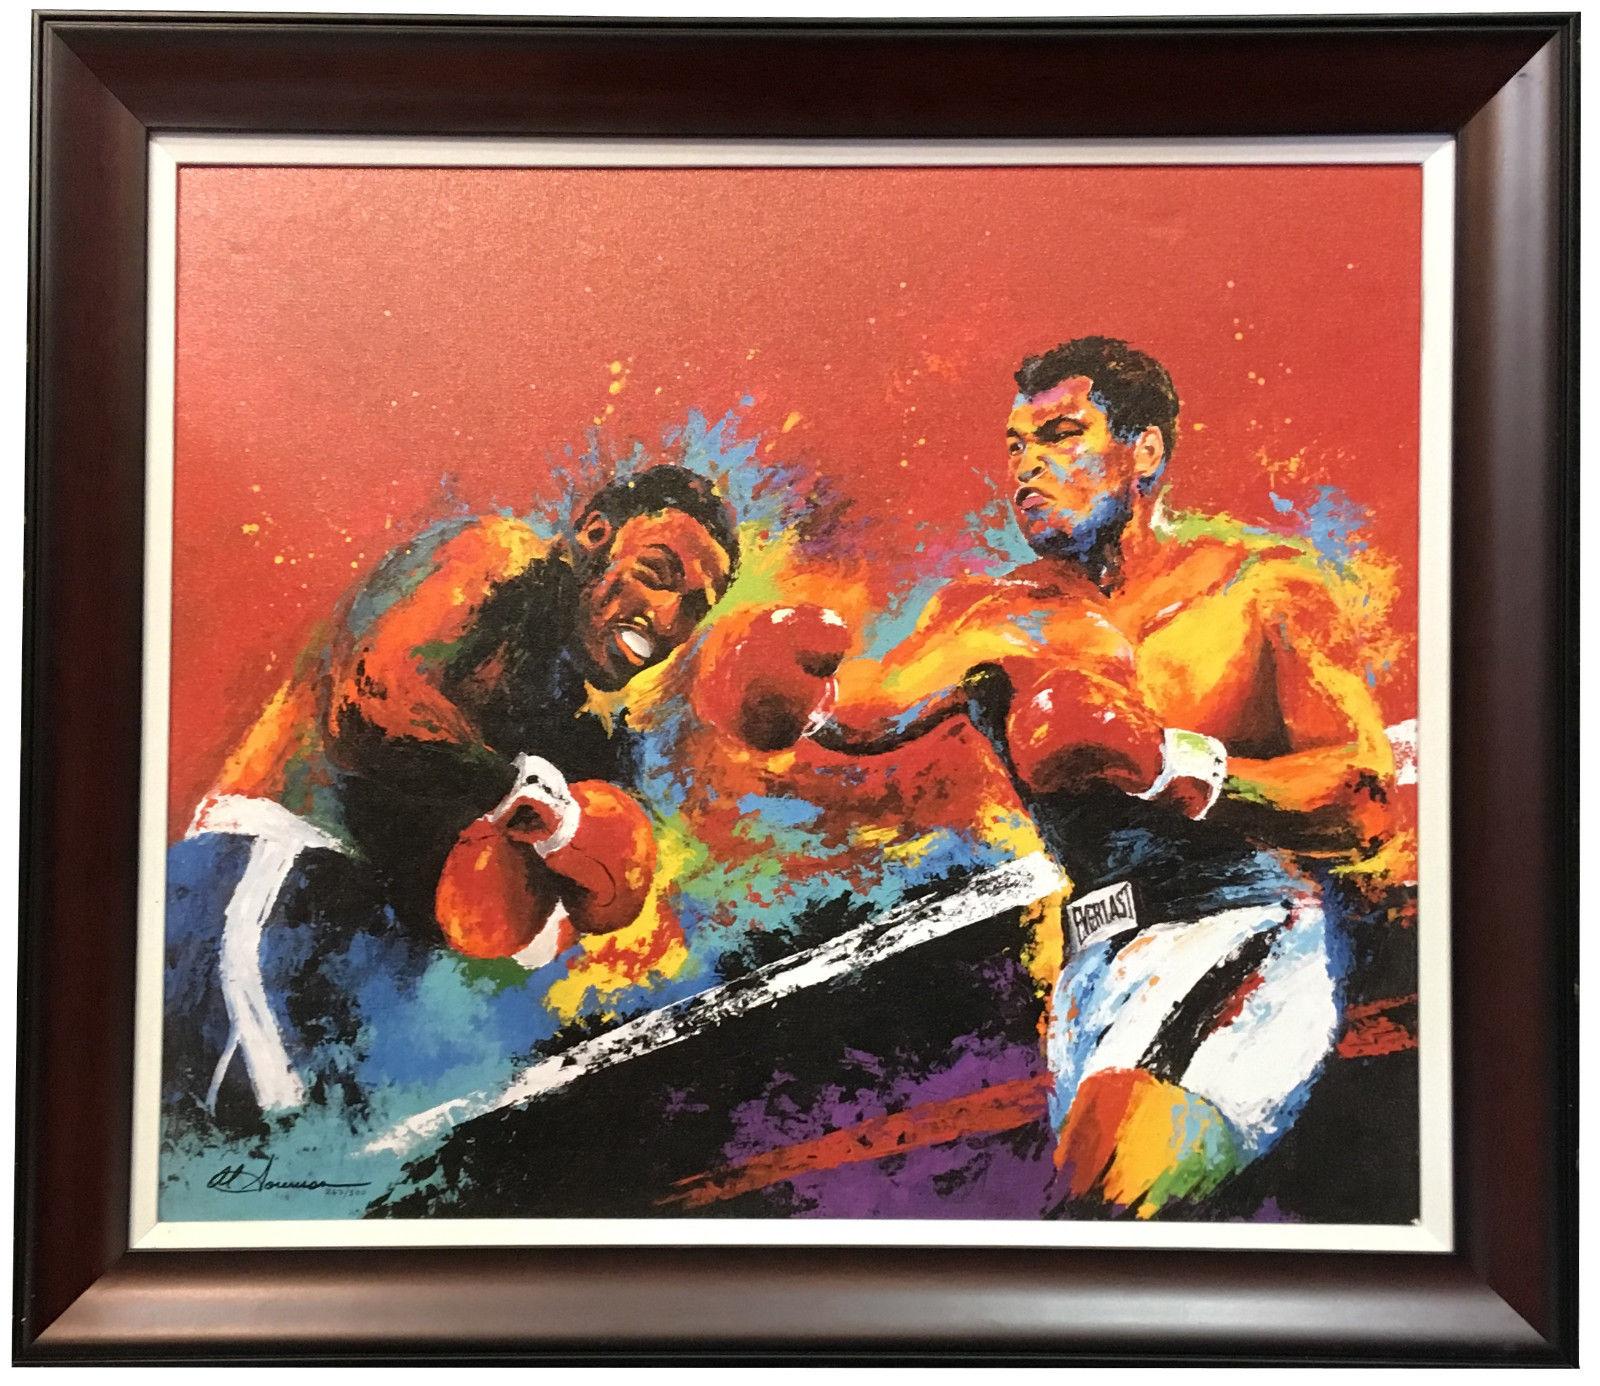 Muhammad Ali & Joe Fraizer Framed 18×24 Giclee Canvas Artwork